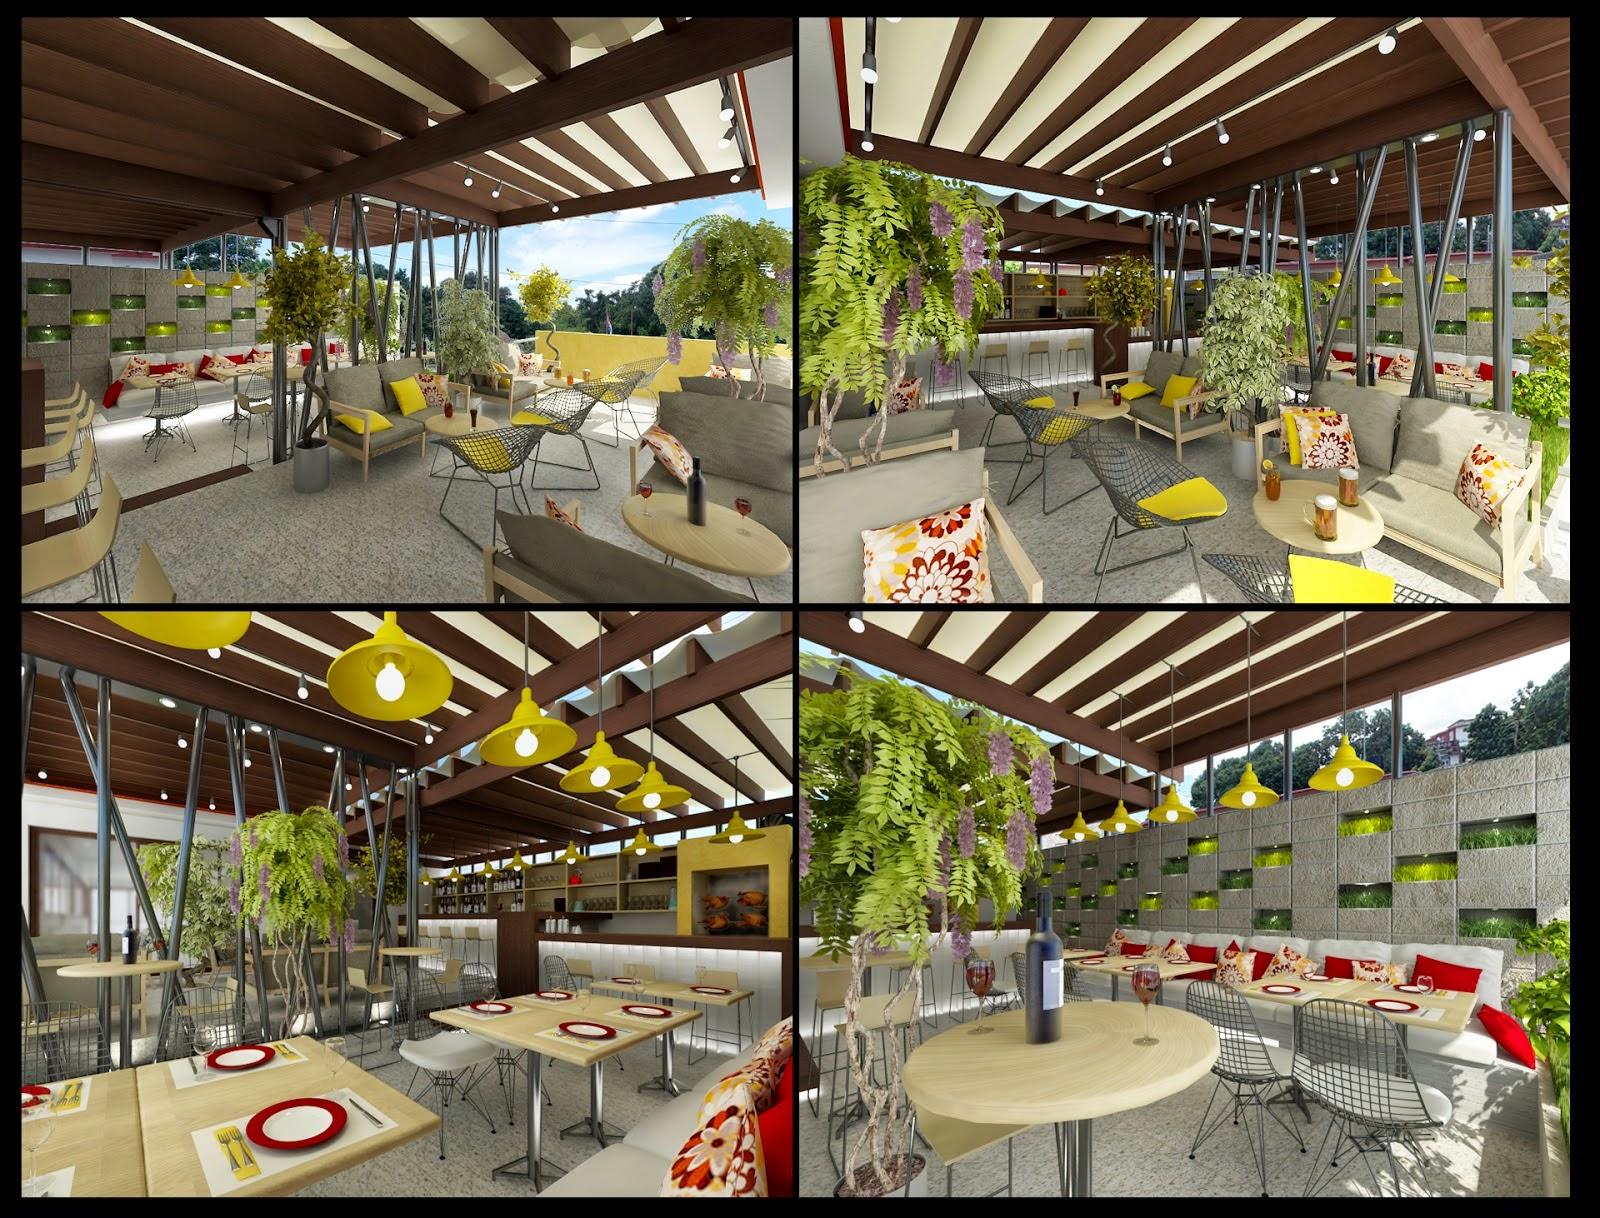 Dag arquitectos restaurante en montebarreto for Restaurante arquitectura